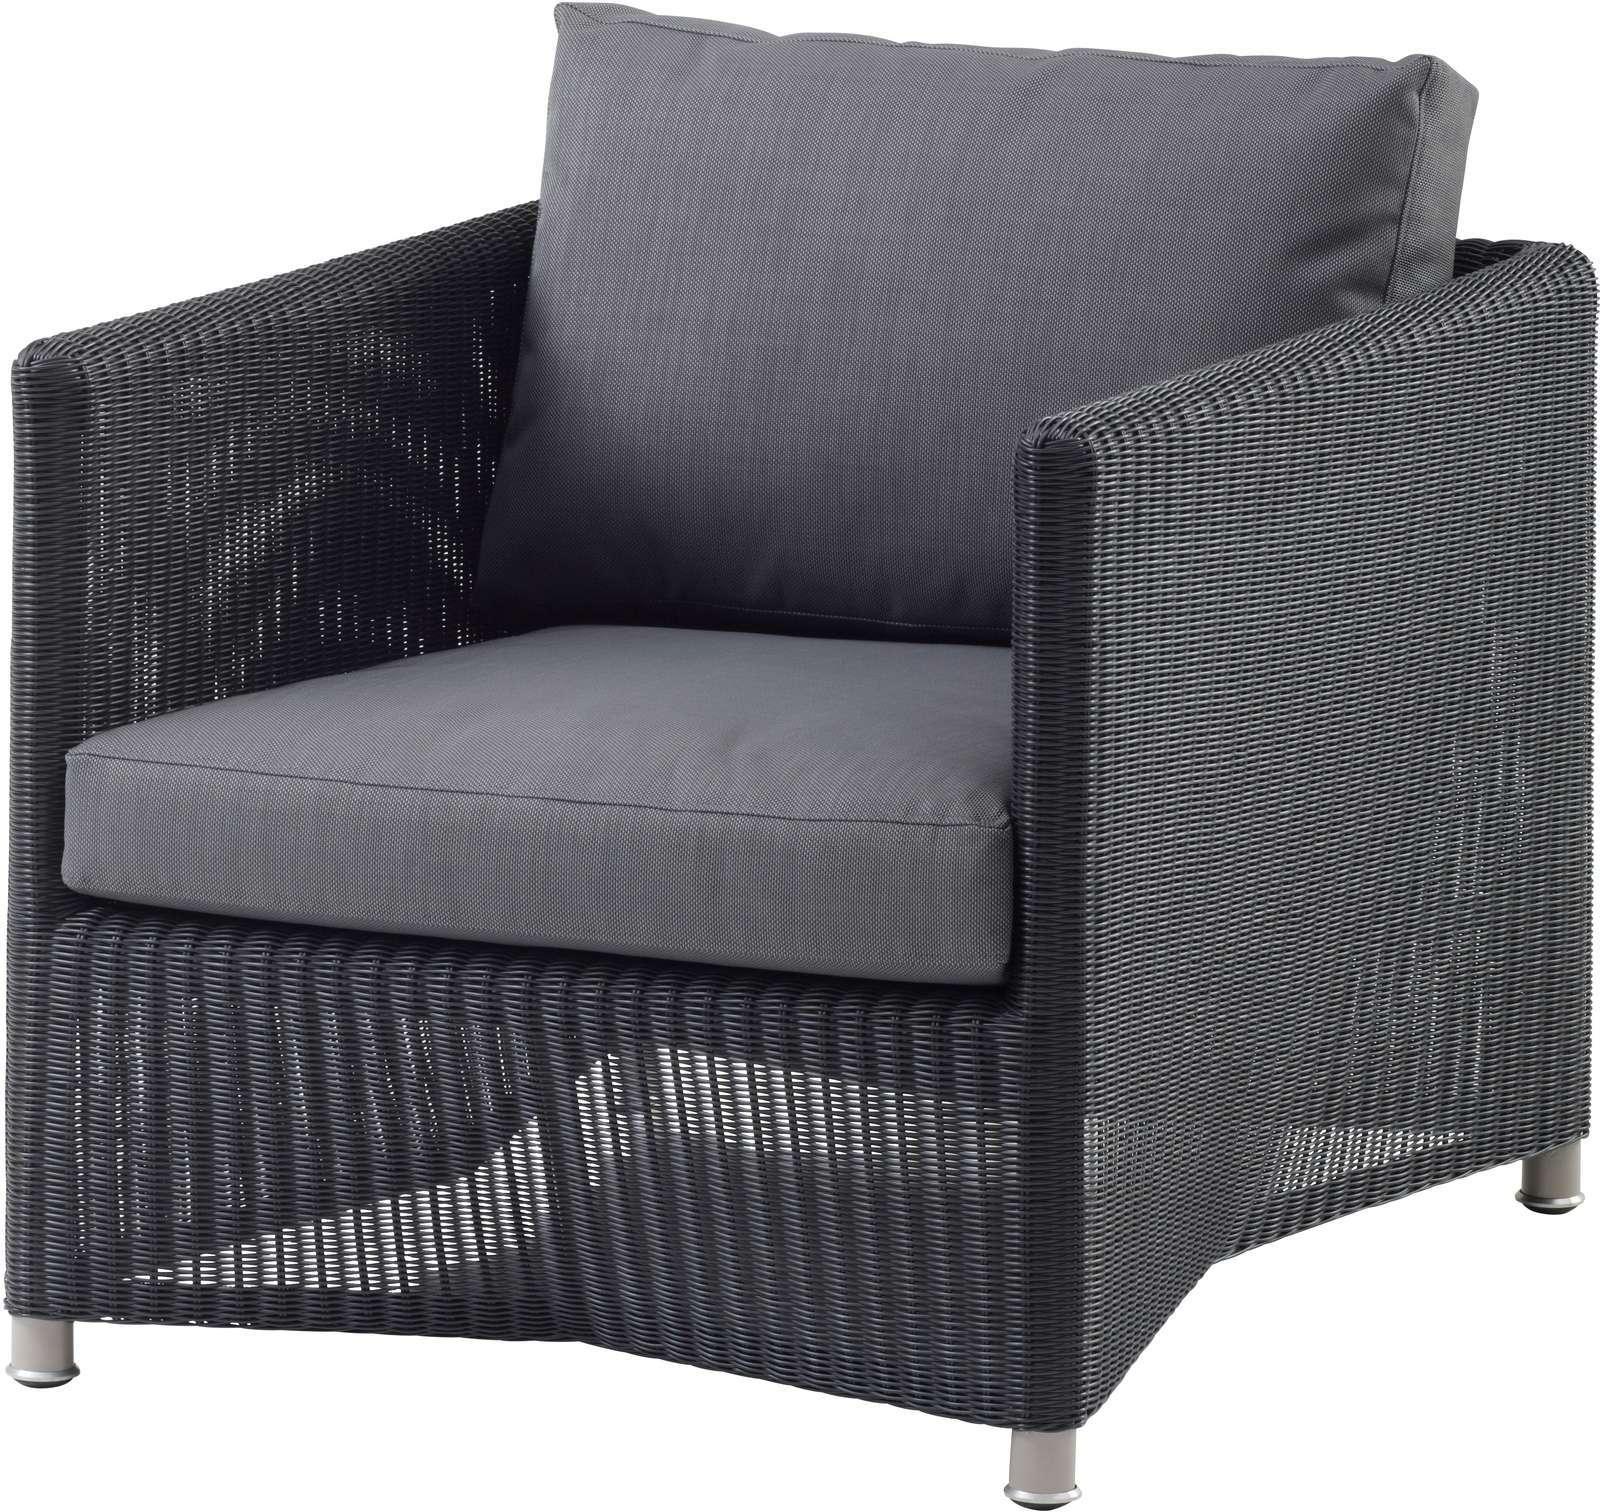 Diamond Outdoor Lounge Sessel Cane-Line